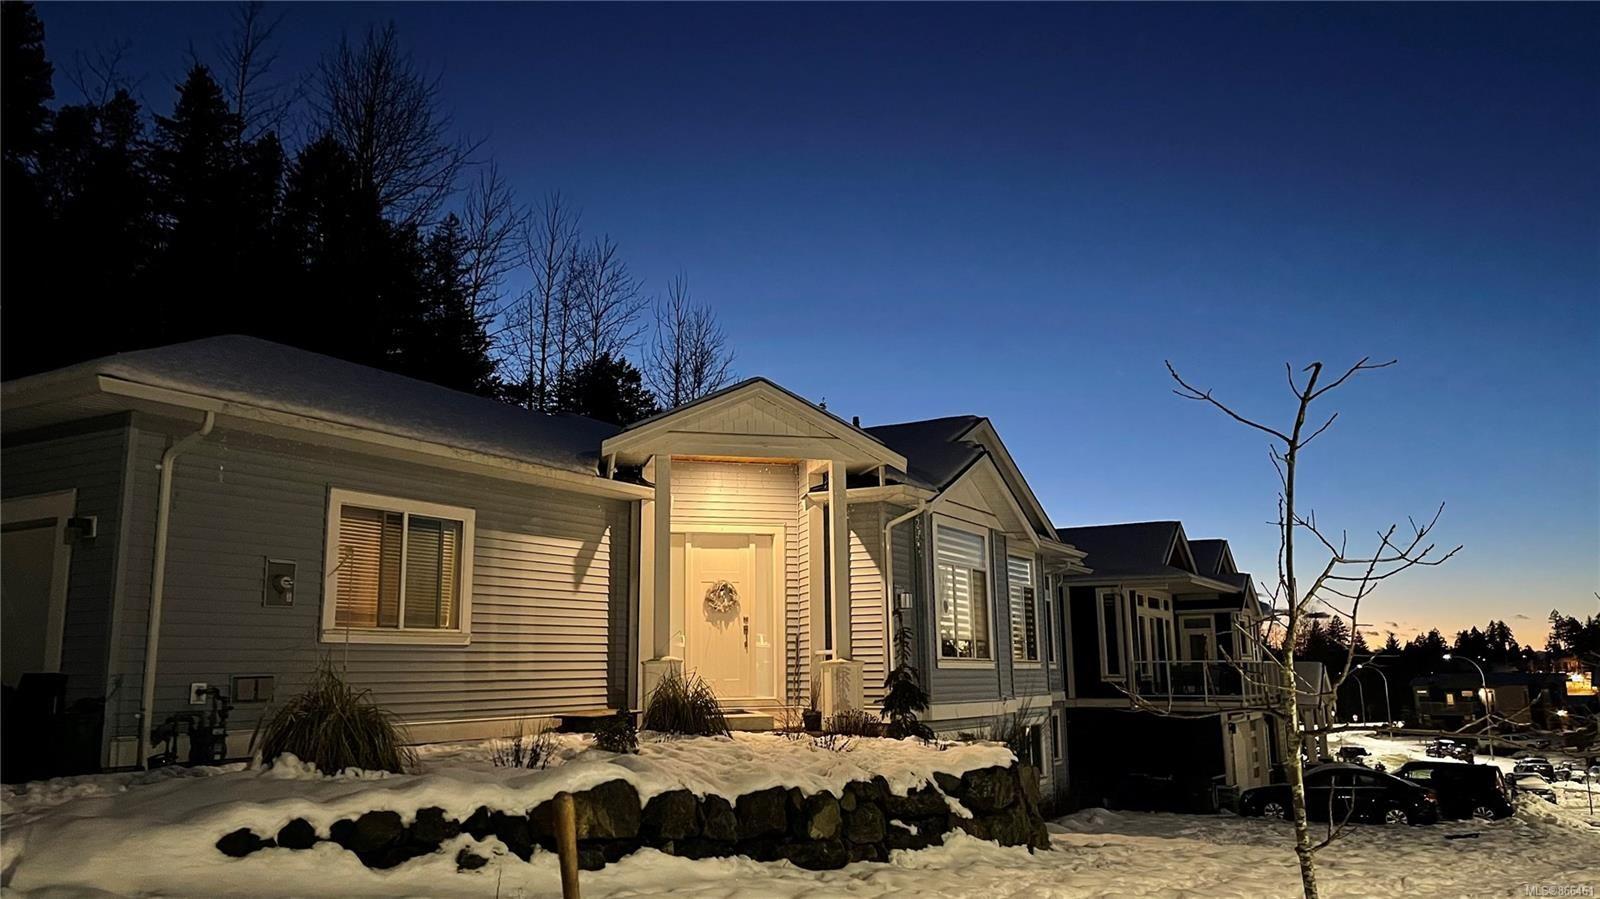 Main Photo: 5605 Linley Valley Dr in : Na North Nanaimo House for sale (Nanaimo)  : MLS®# 866461